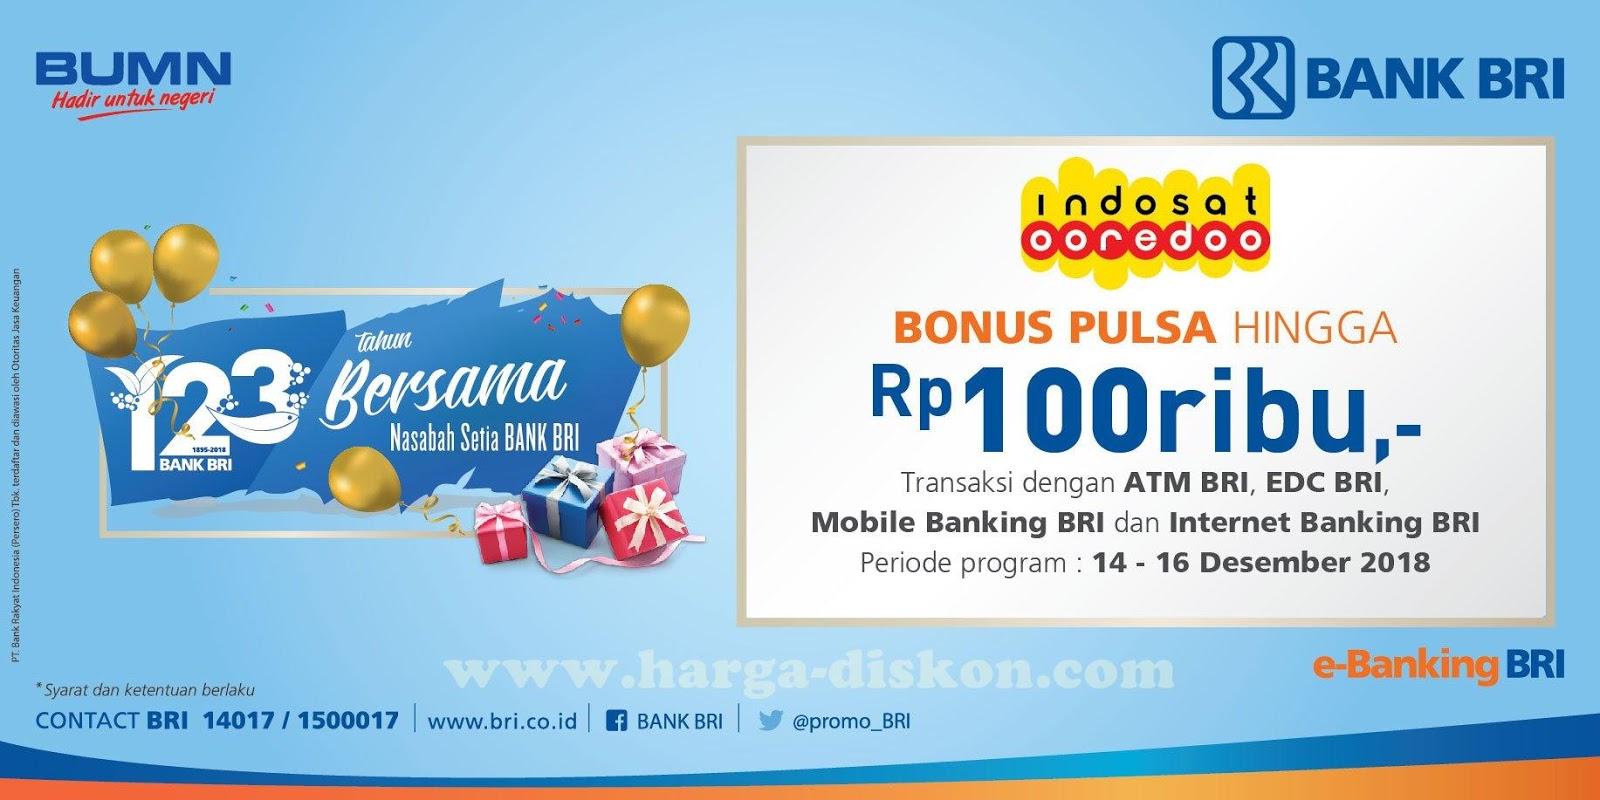 Promo Bri Bonus Pulsa Hingga Rp100 000 Periode 14 16 Desember 2018 Harga Diskon